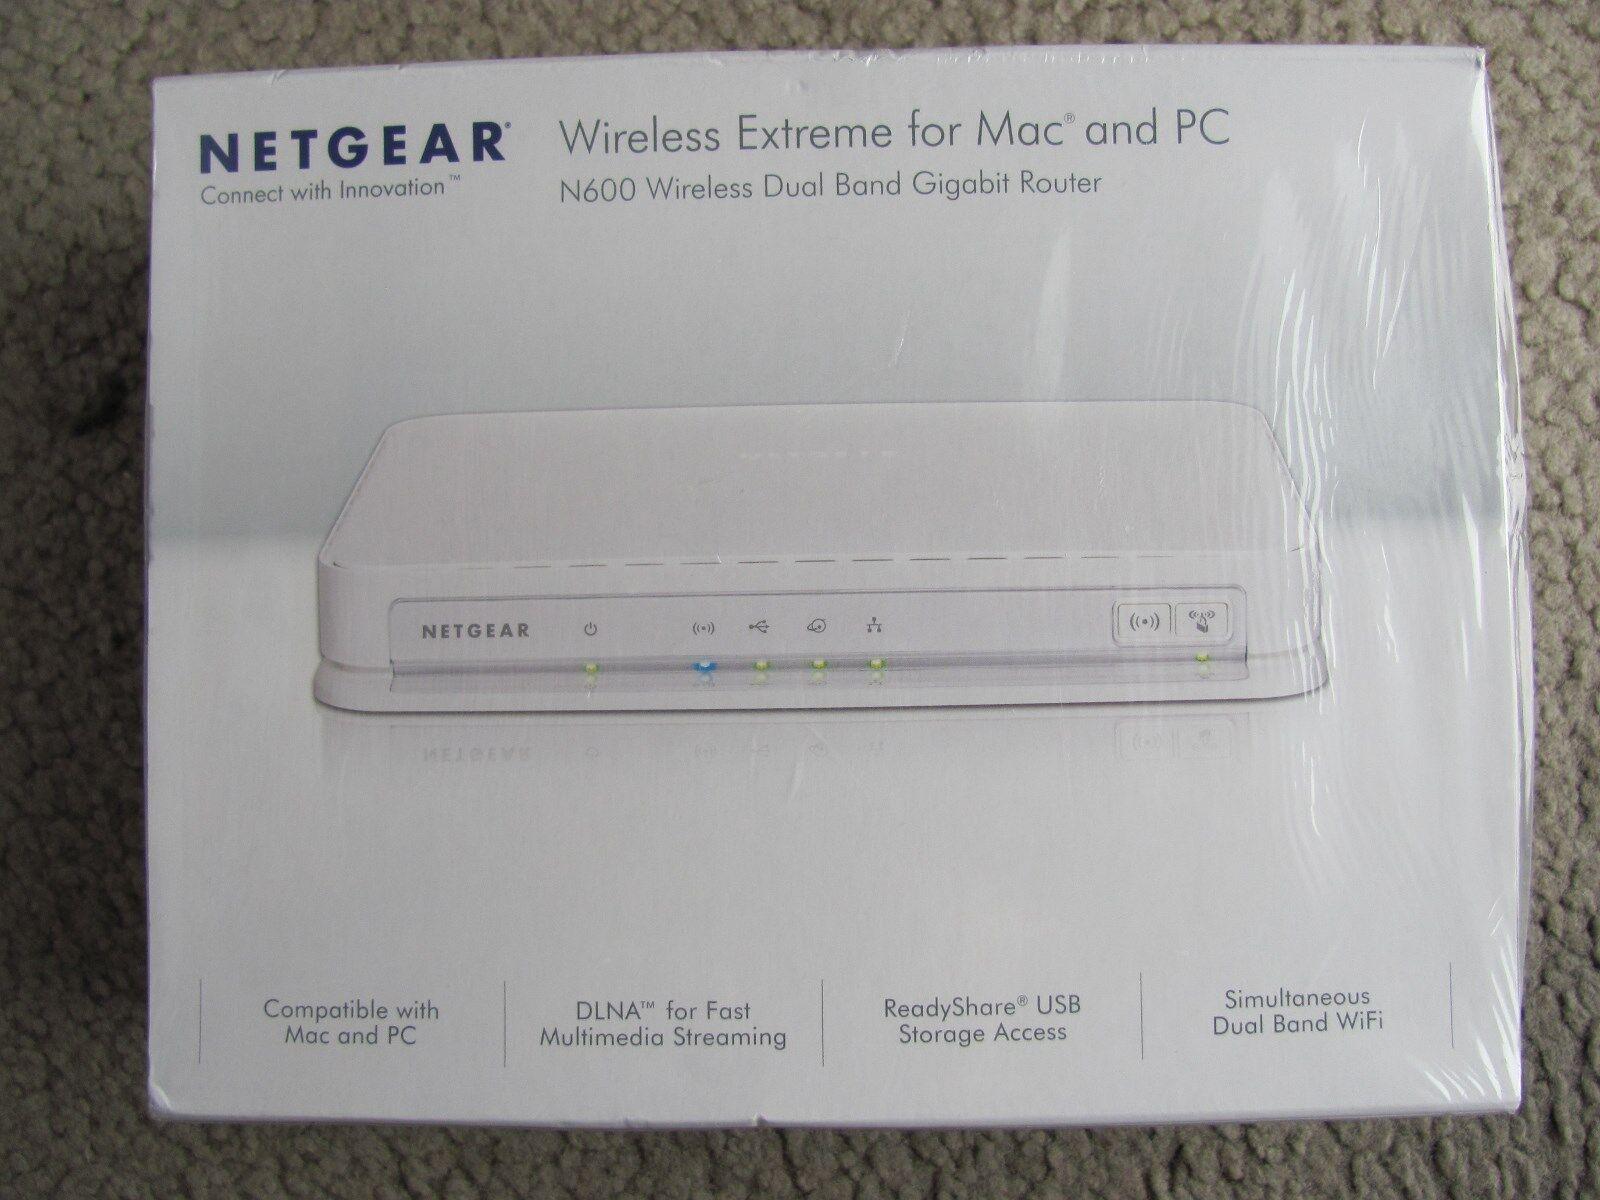 Netgear WNDRMAC 300 Mbps 4-Port Gigabit Wireless N Router (WNDRMAC ...